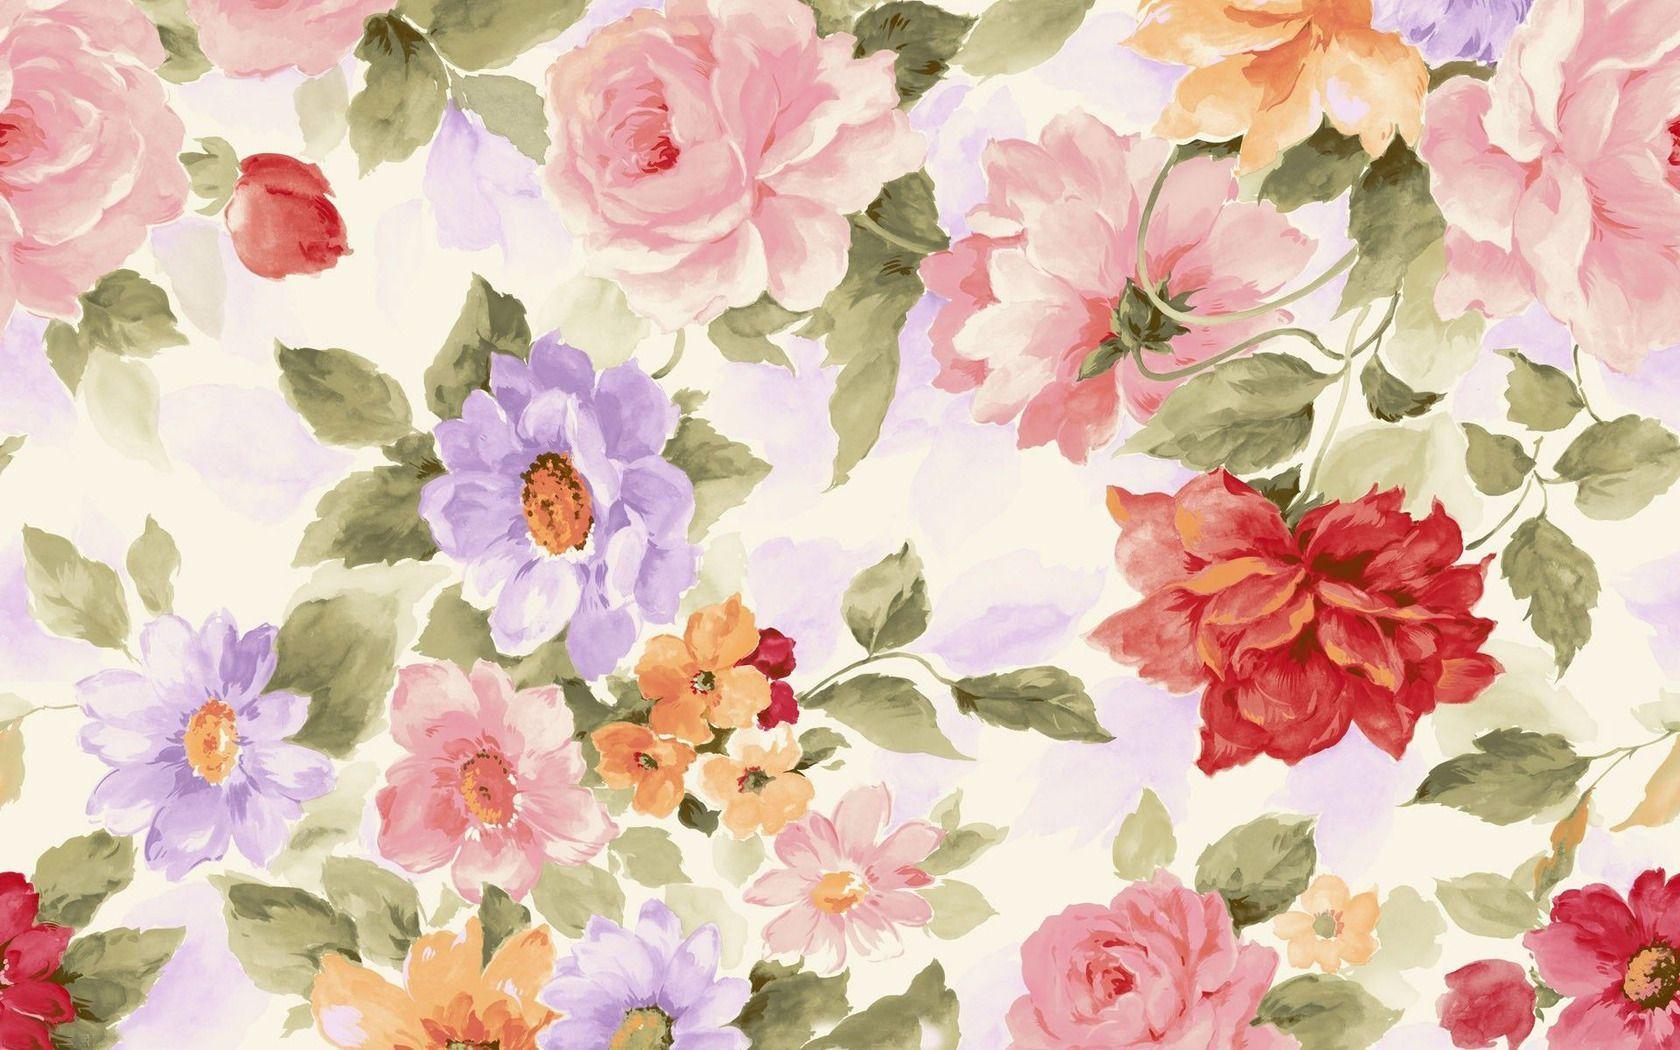 Desktop Flower Painting Wallpapers Wallpaper Cave